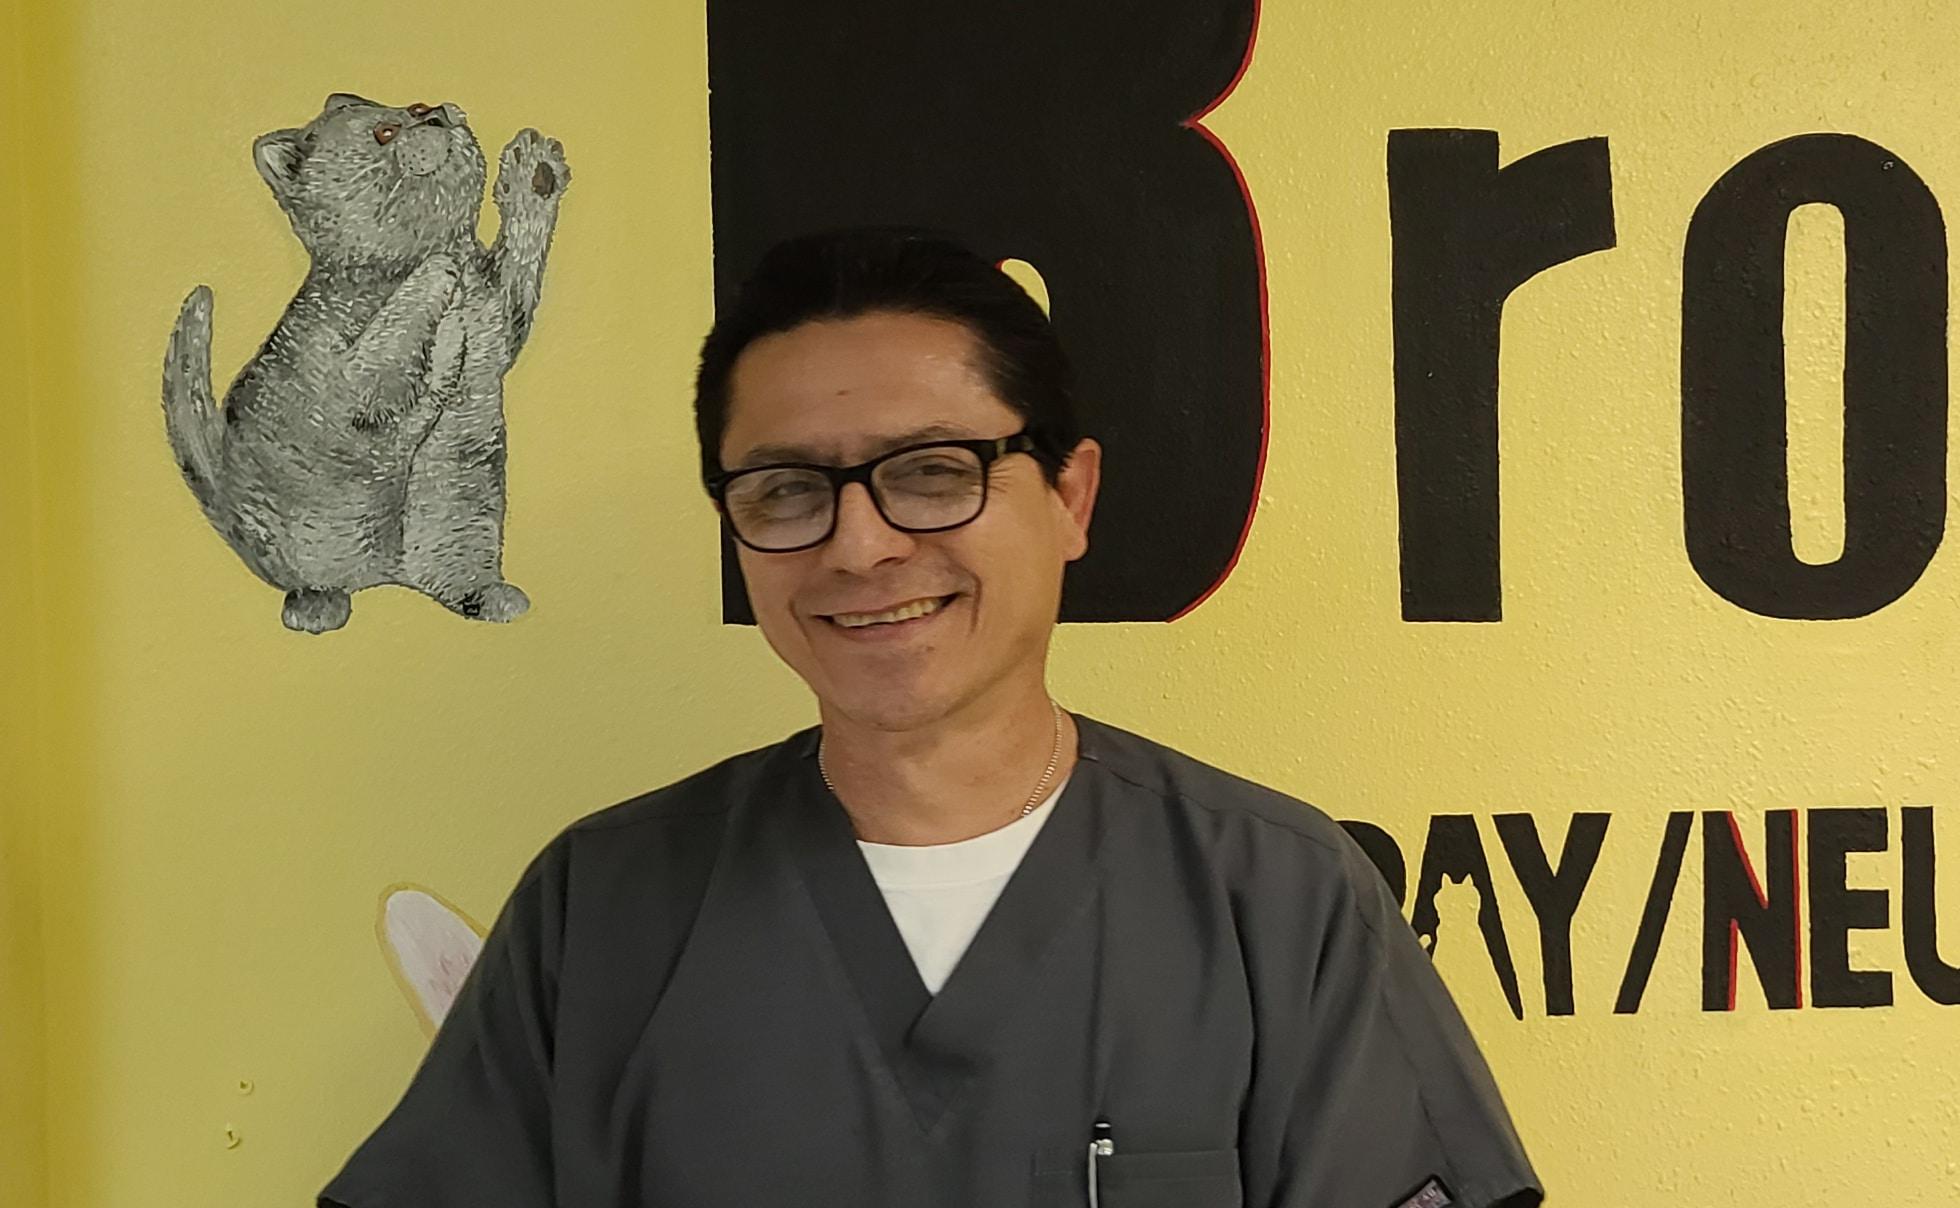 Hernan G. Sandoval